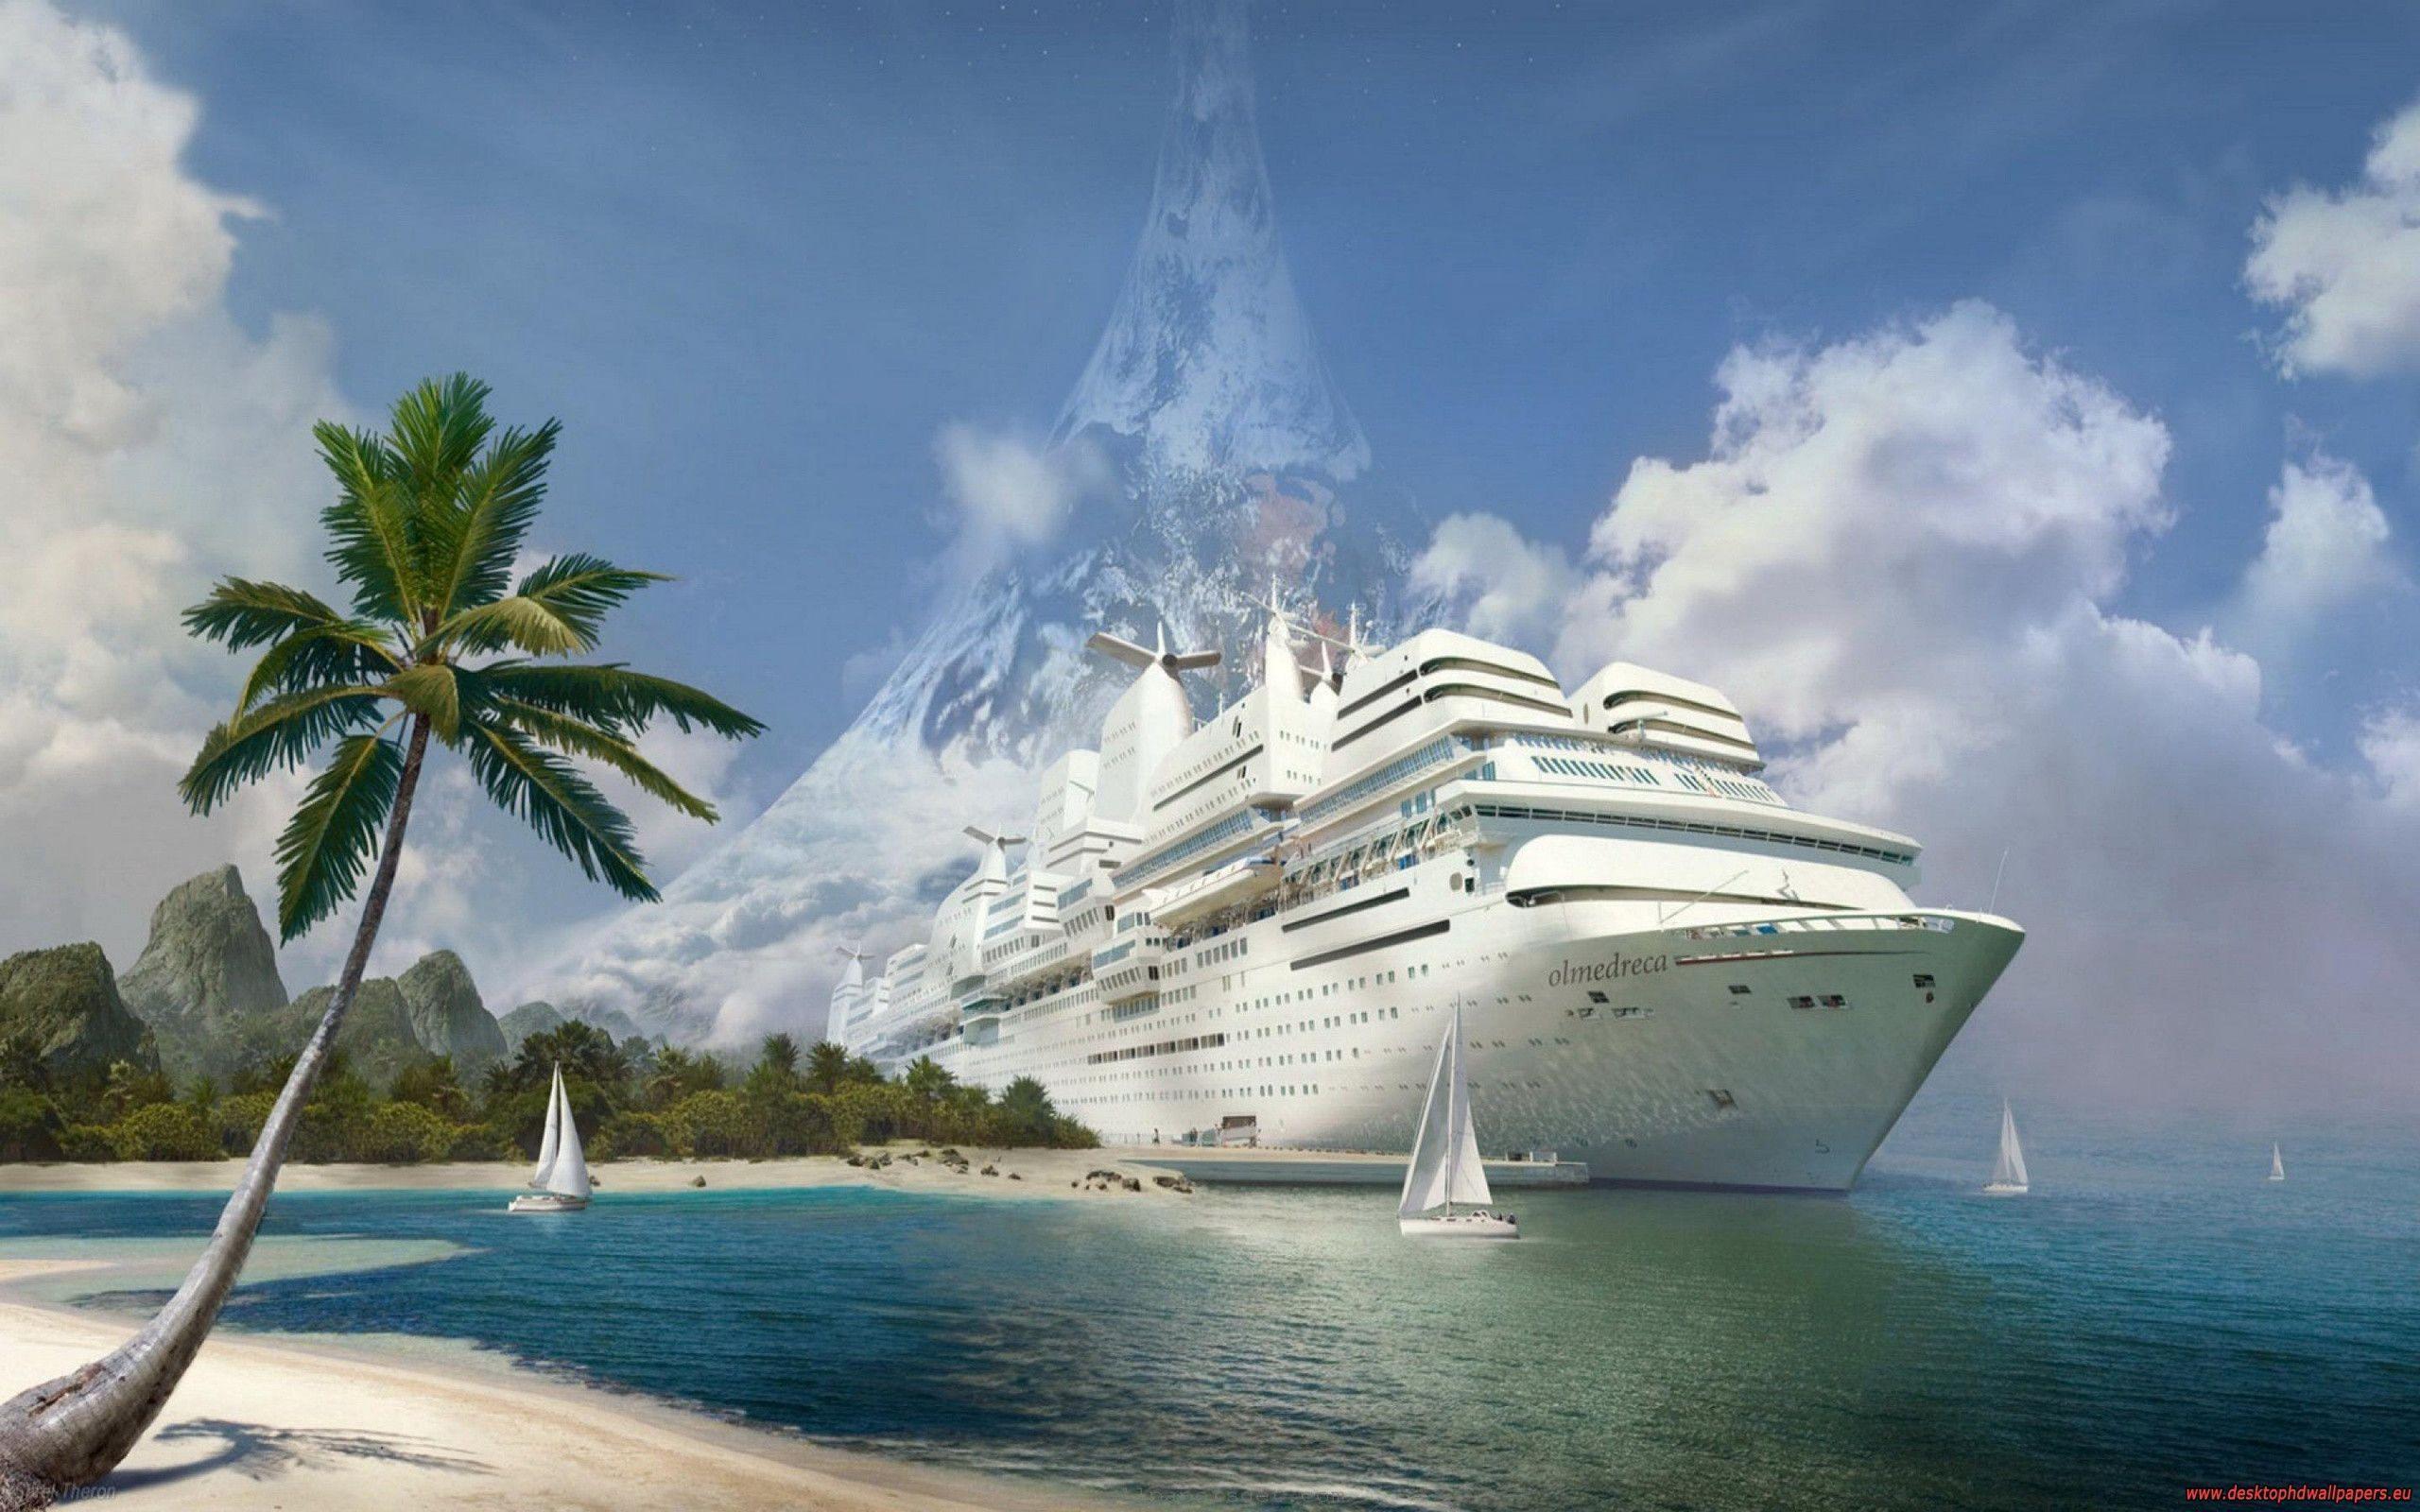 cruise ship wallpaper background - photo #14